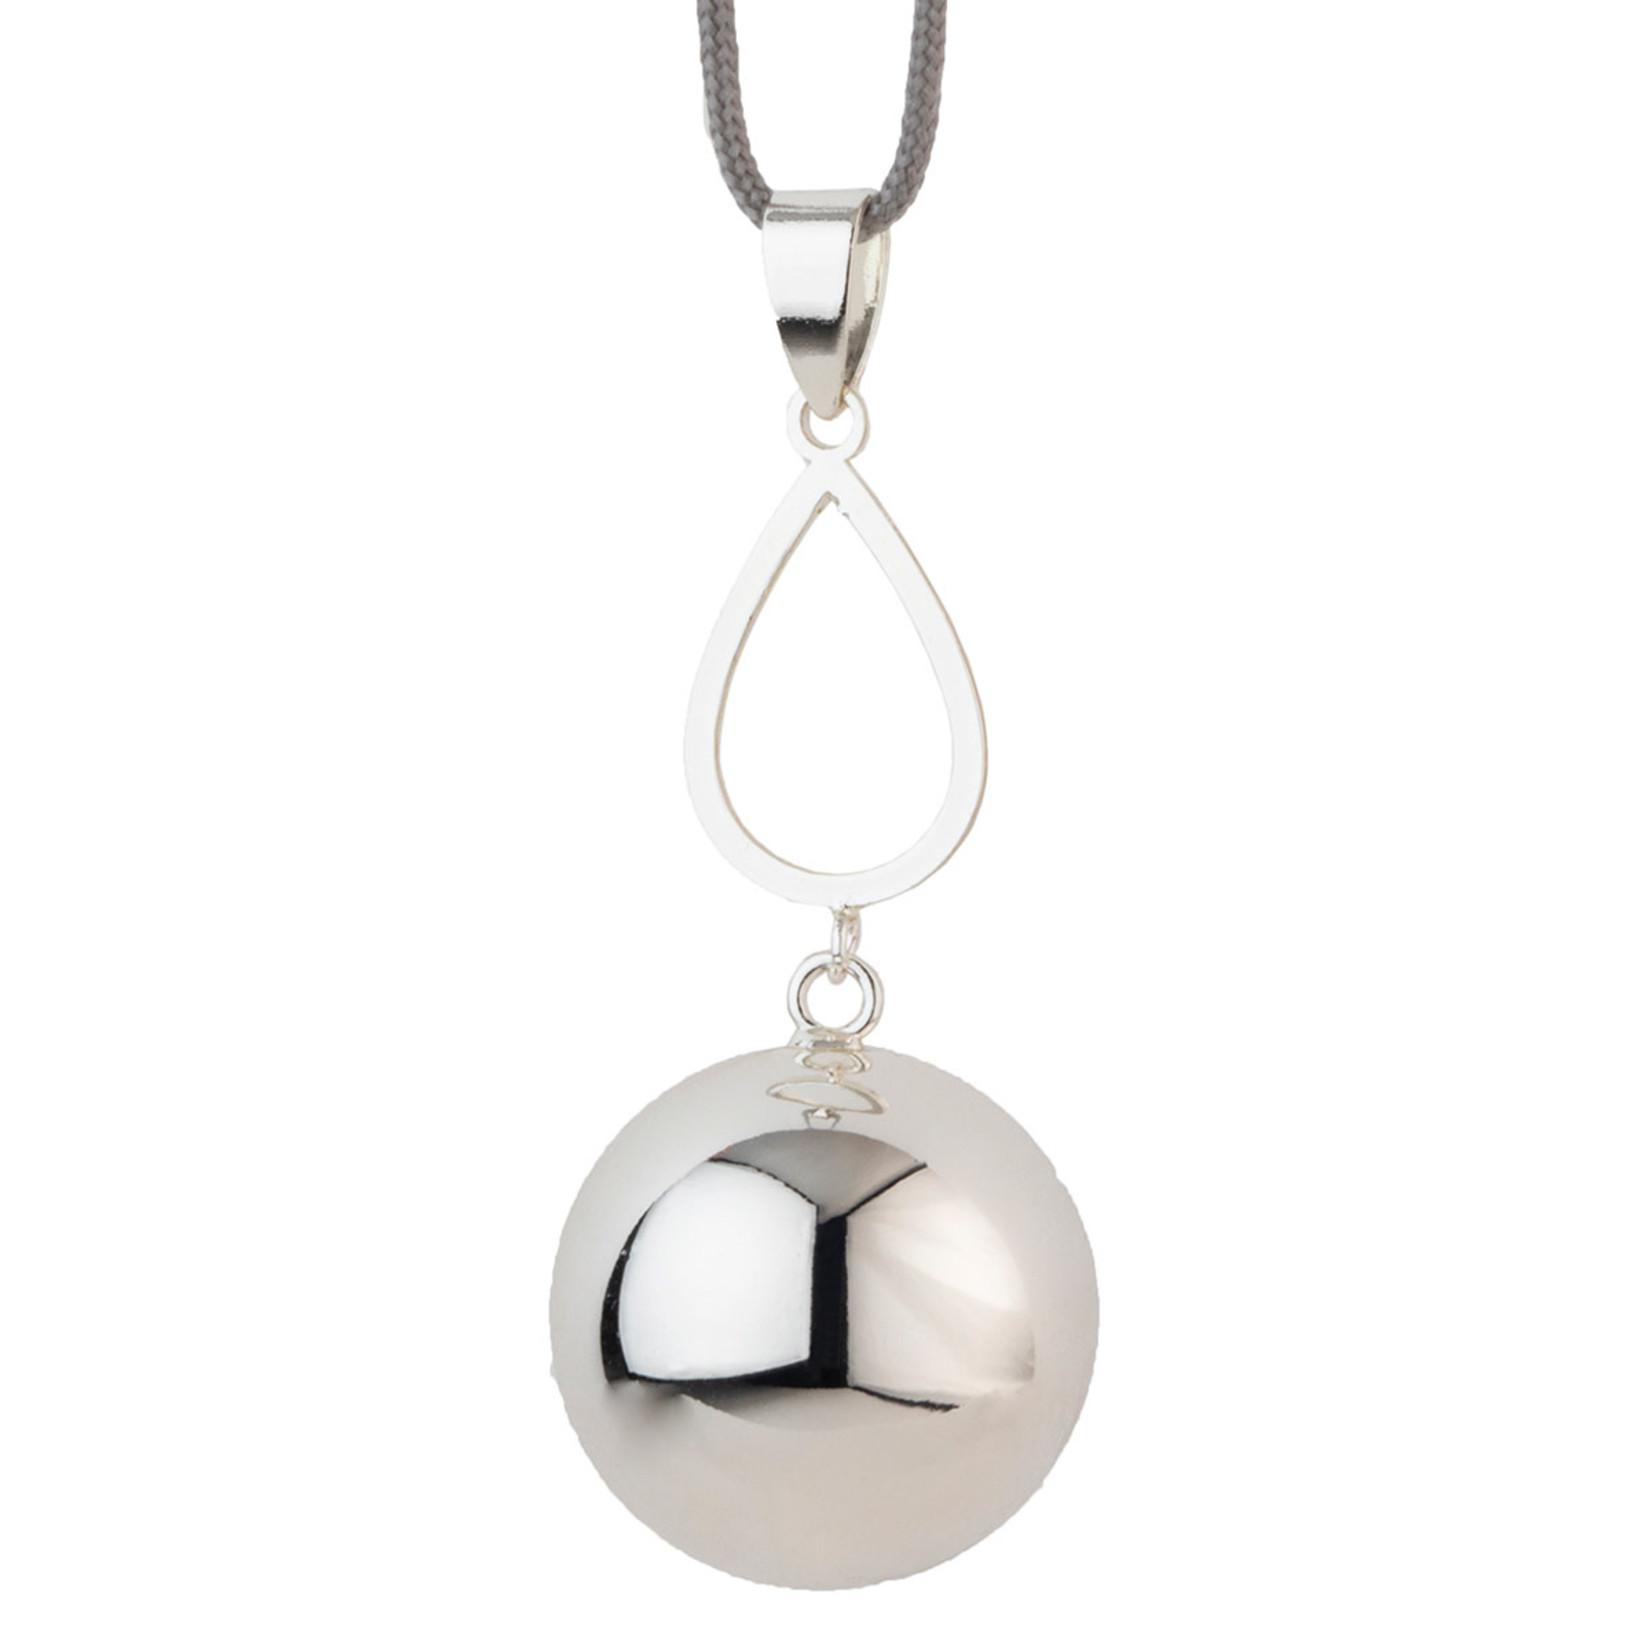 Bola Bola - Babylonia Bola - Silver drop - One size